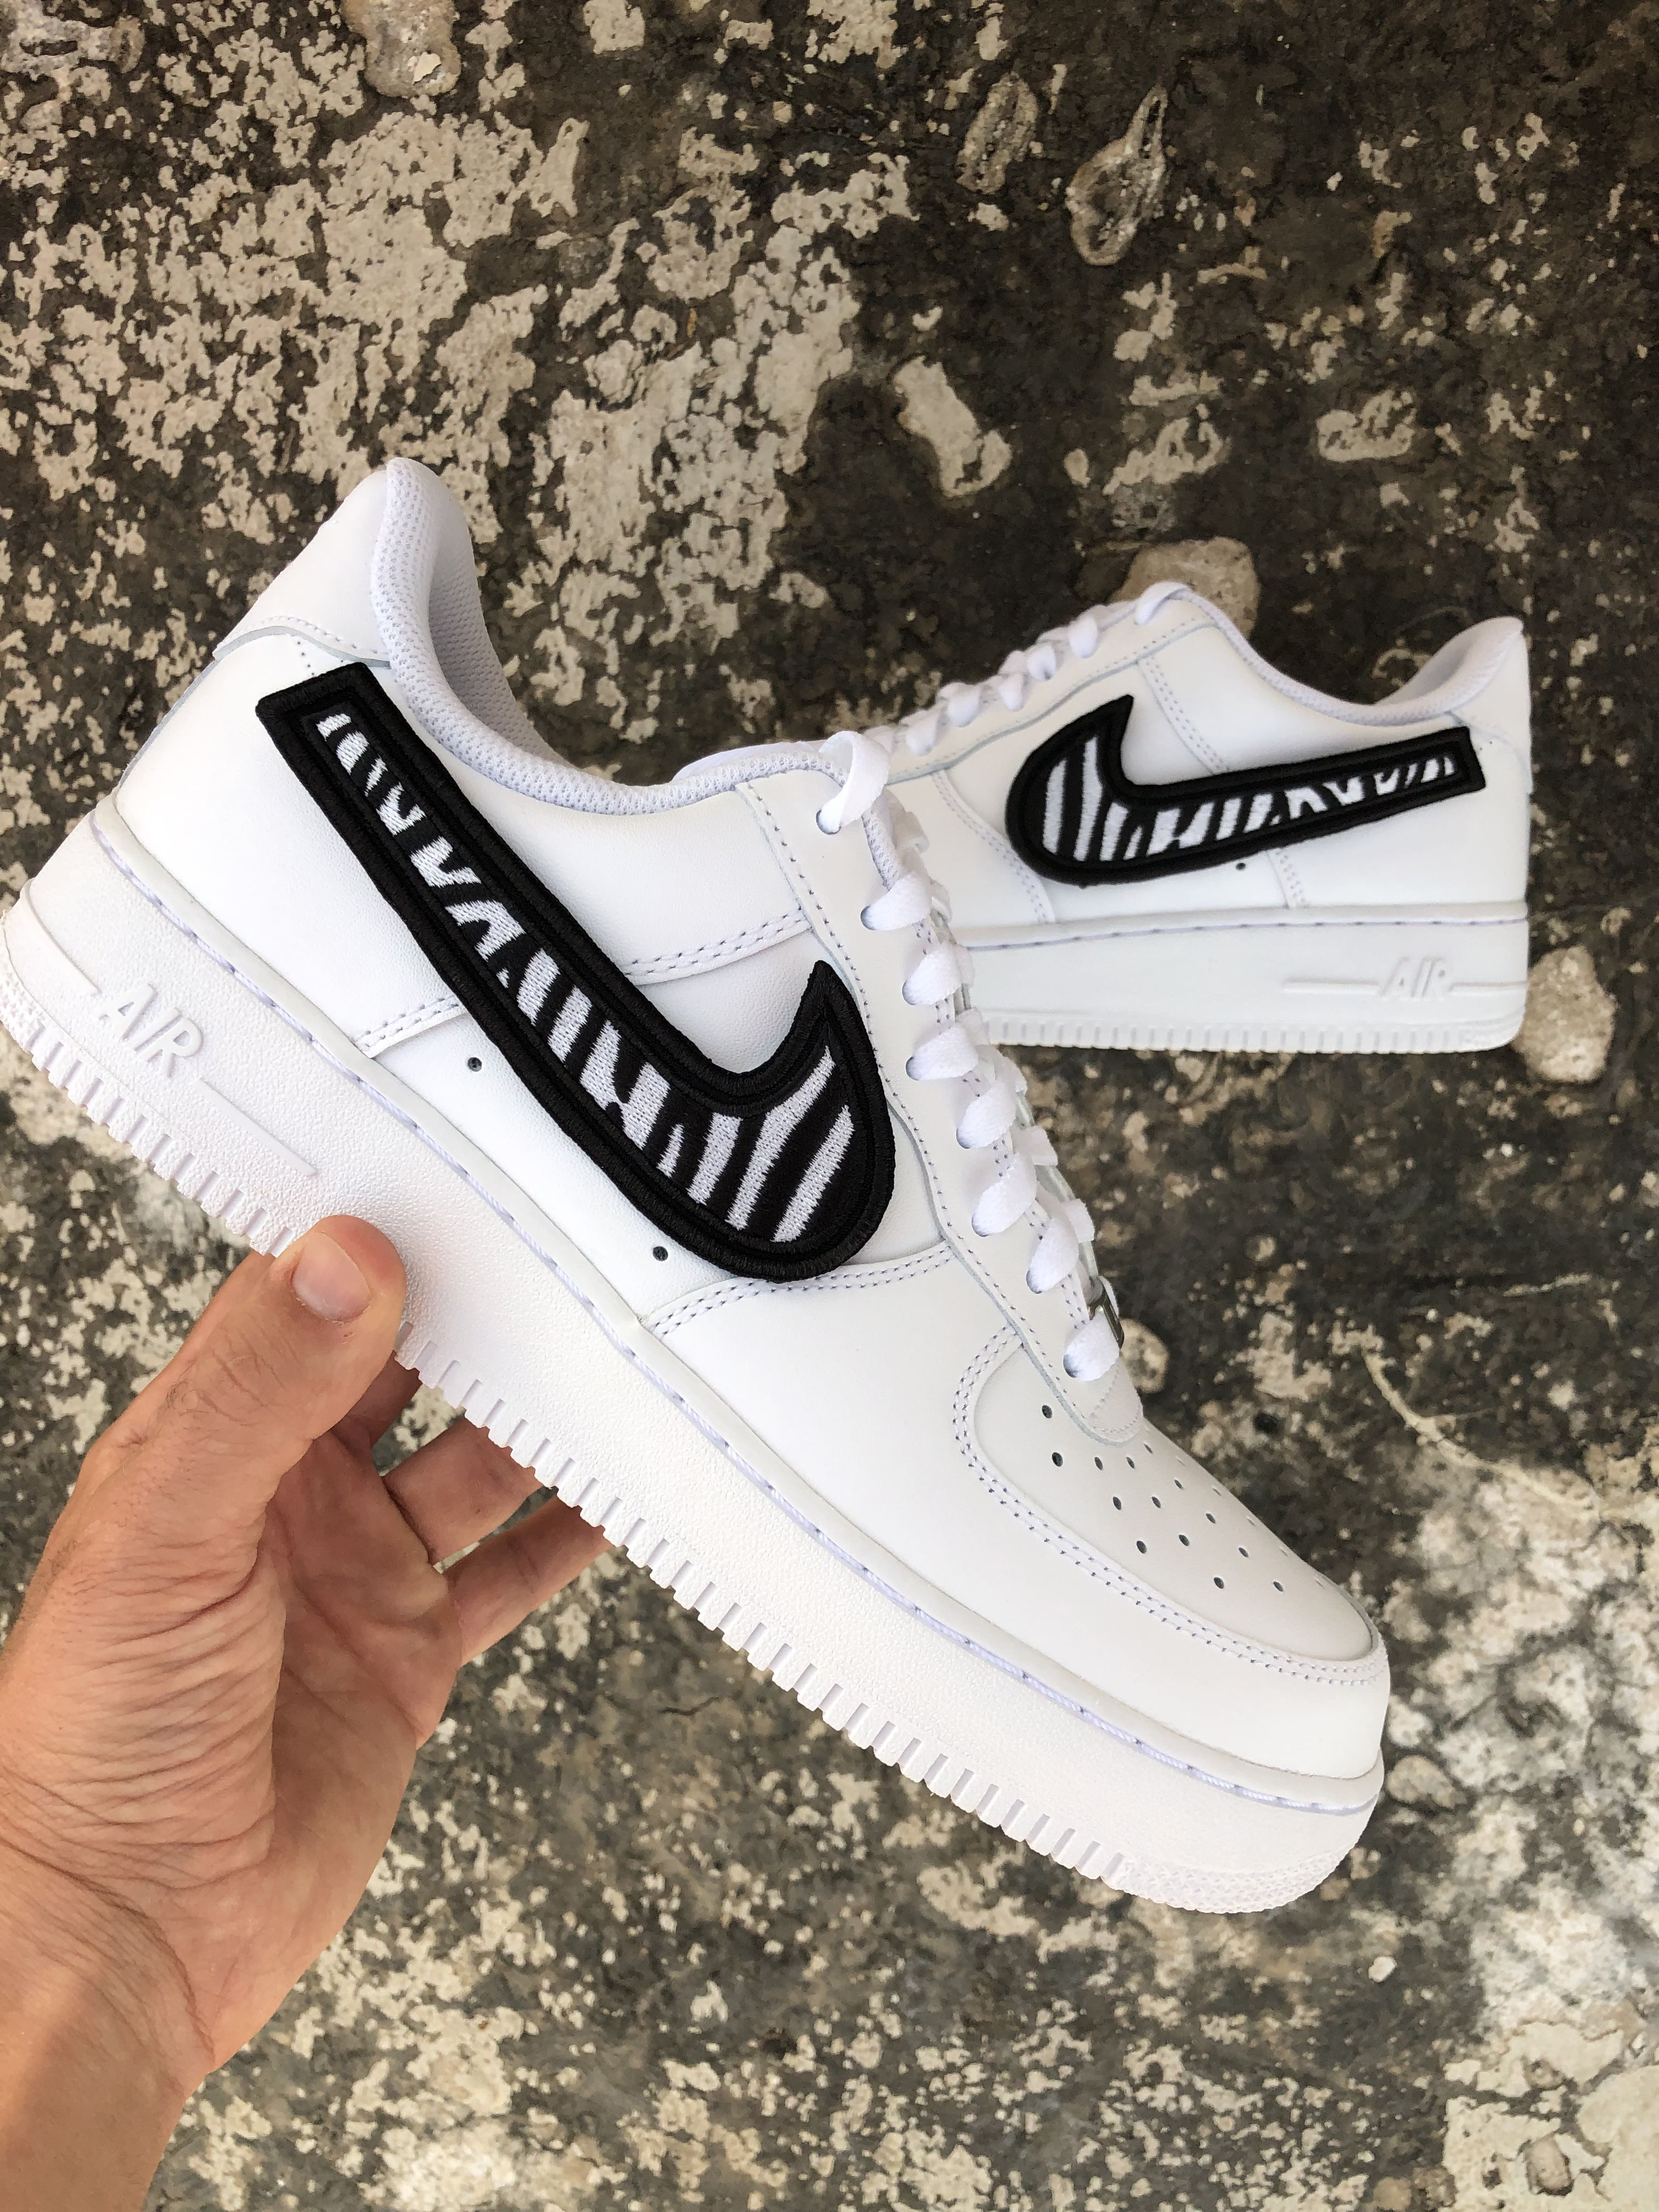 Custom nike shoes, Nike shoe size, Nike